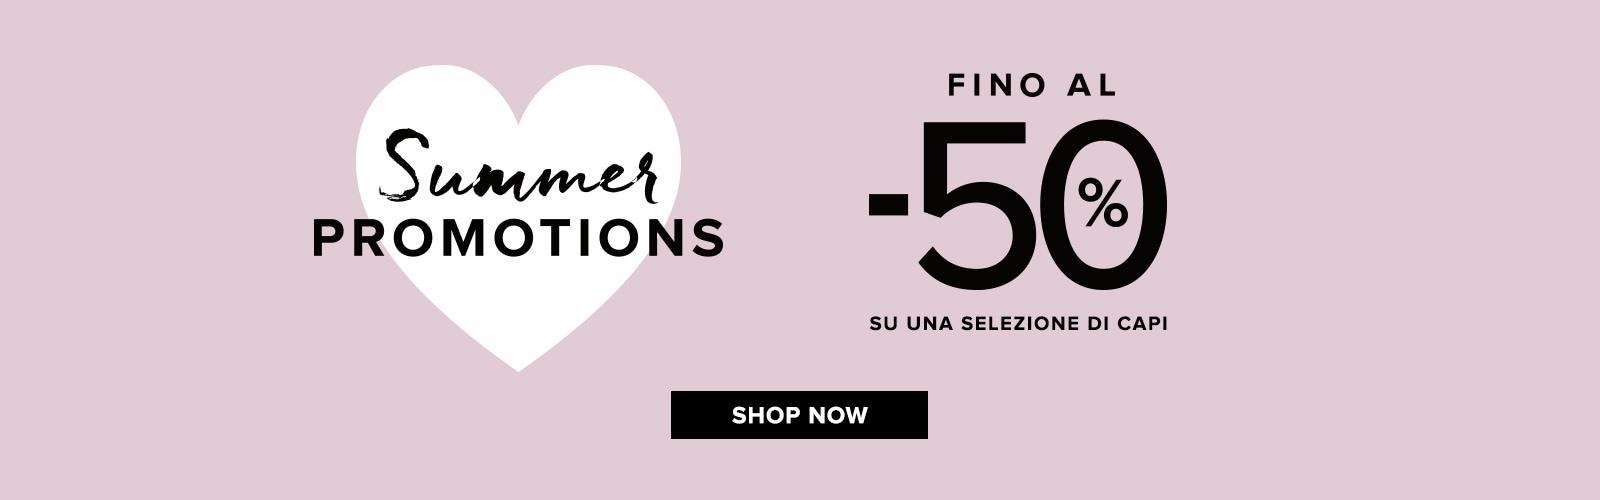 summer promotions fino al -50%